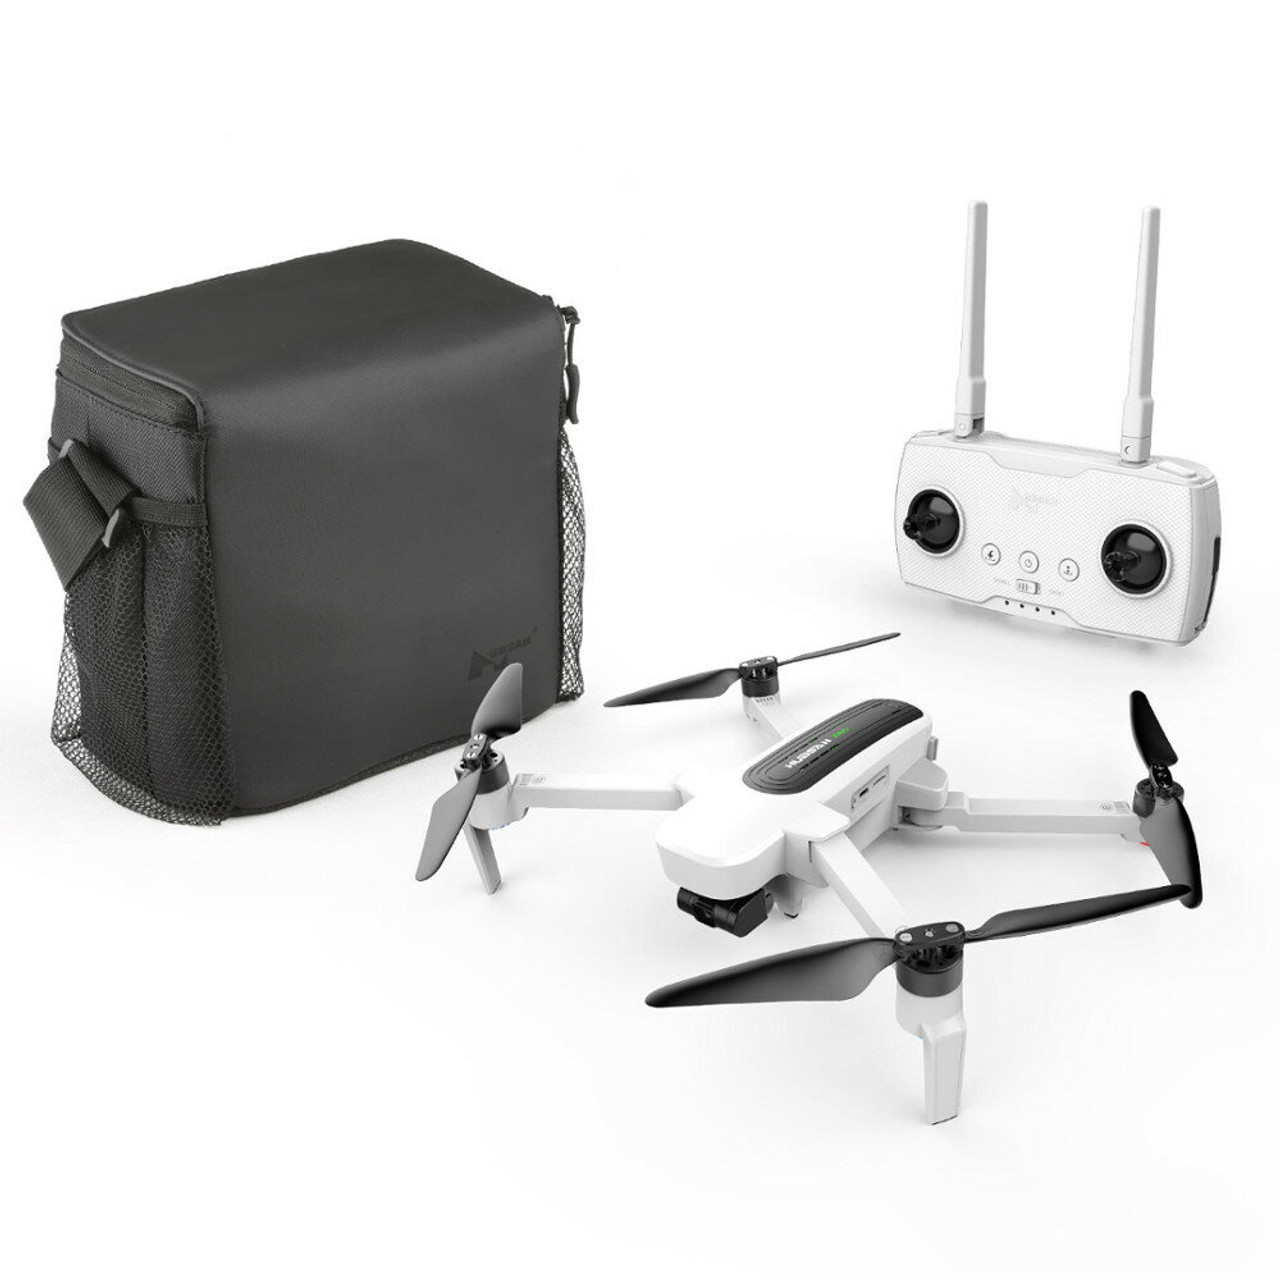 Hubsan H117S Zino 5G WiFi UHD 4K Camera 3-Axis Gimbal RC Camera Drone Quadcopter